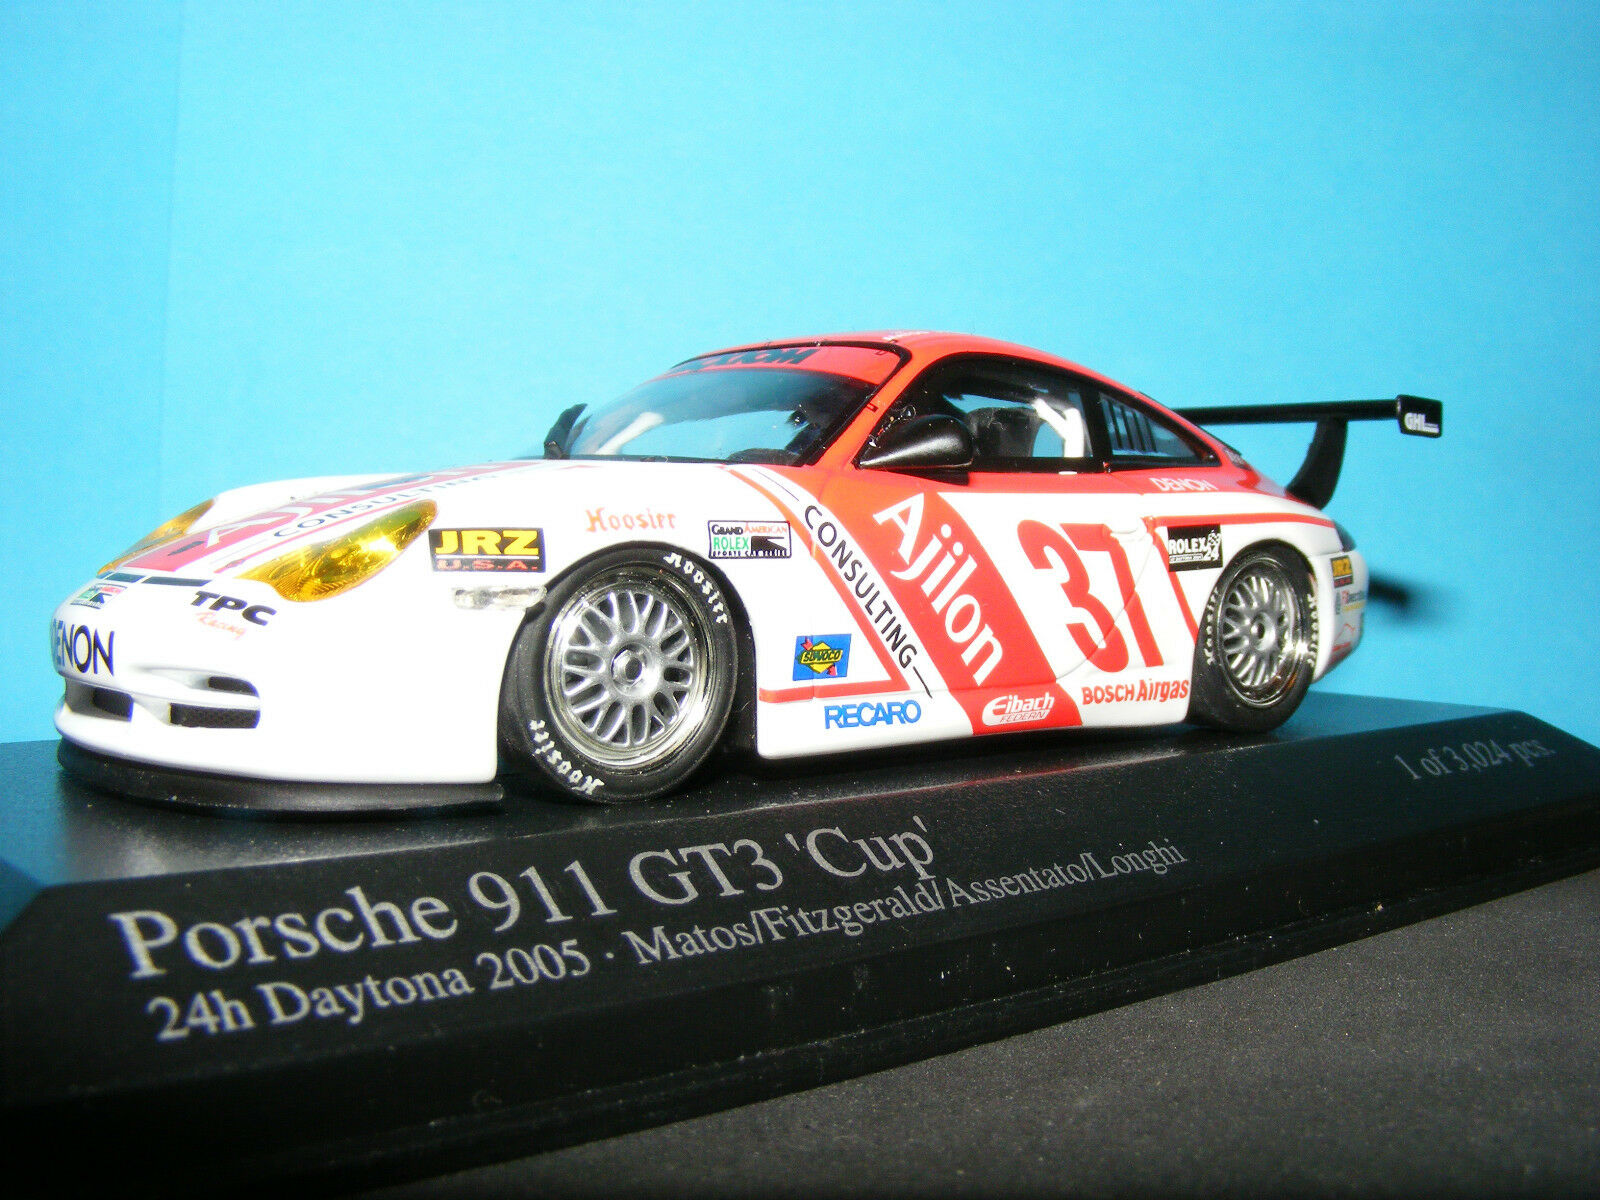 PORSCHE 911 GT 3 CUP Entrant 2005 Daytona 24 hrs. no 37 Minichamps 1 43rd.